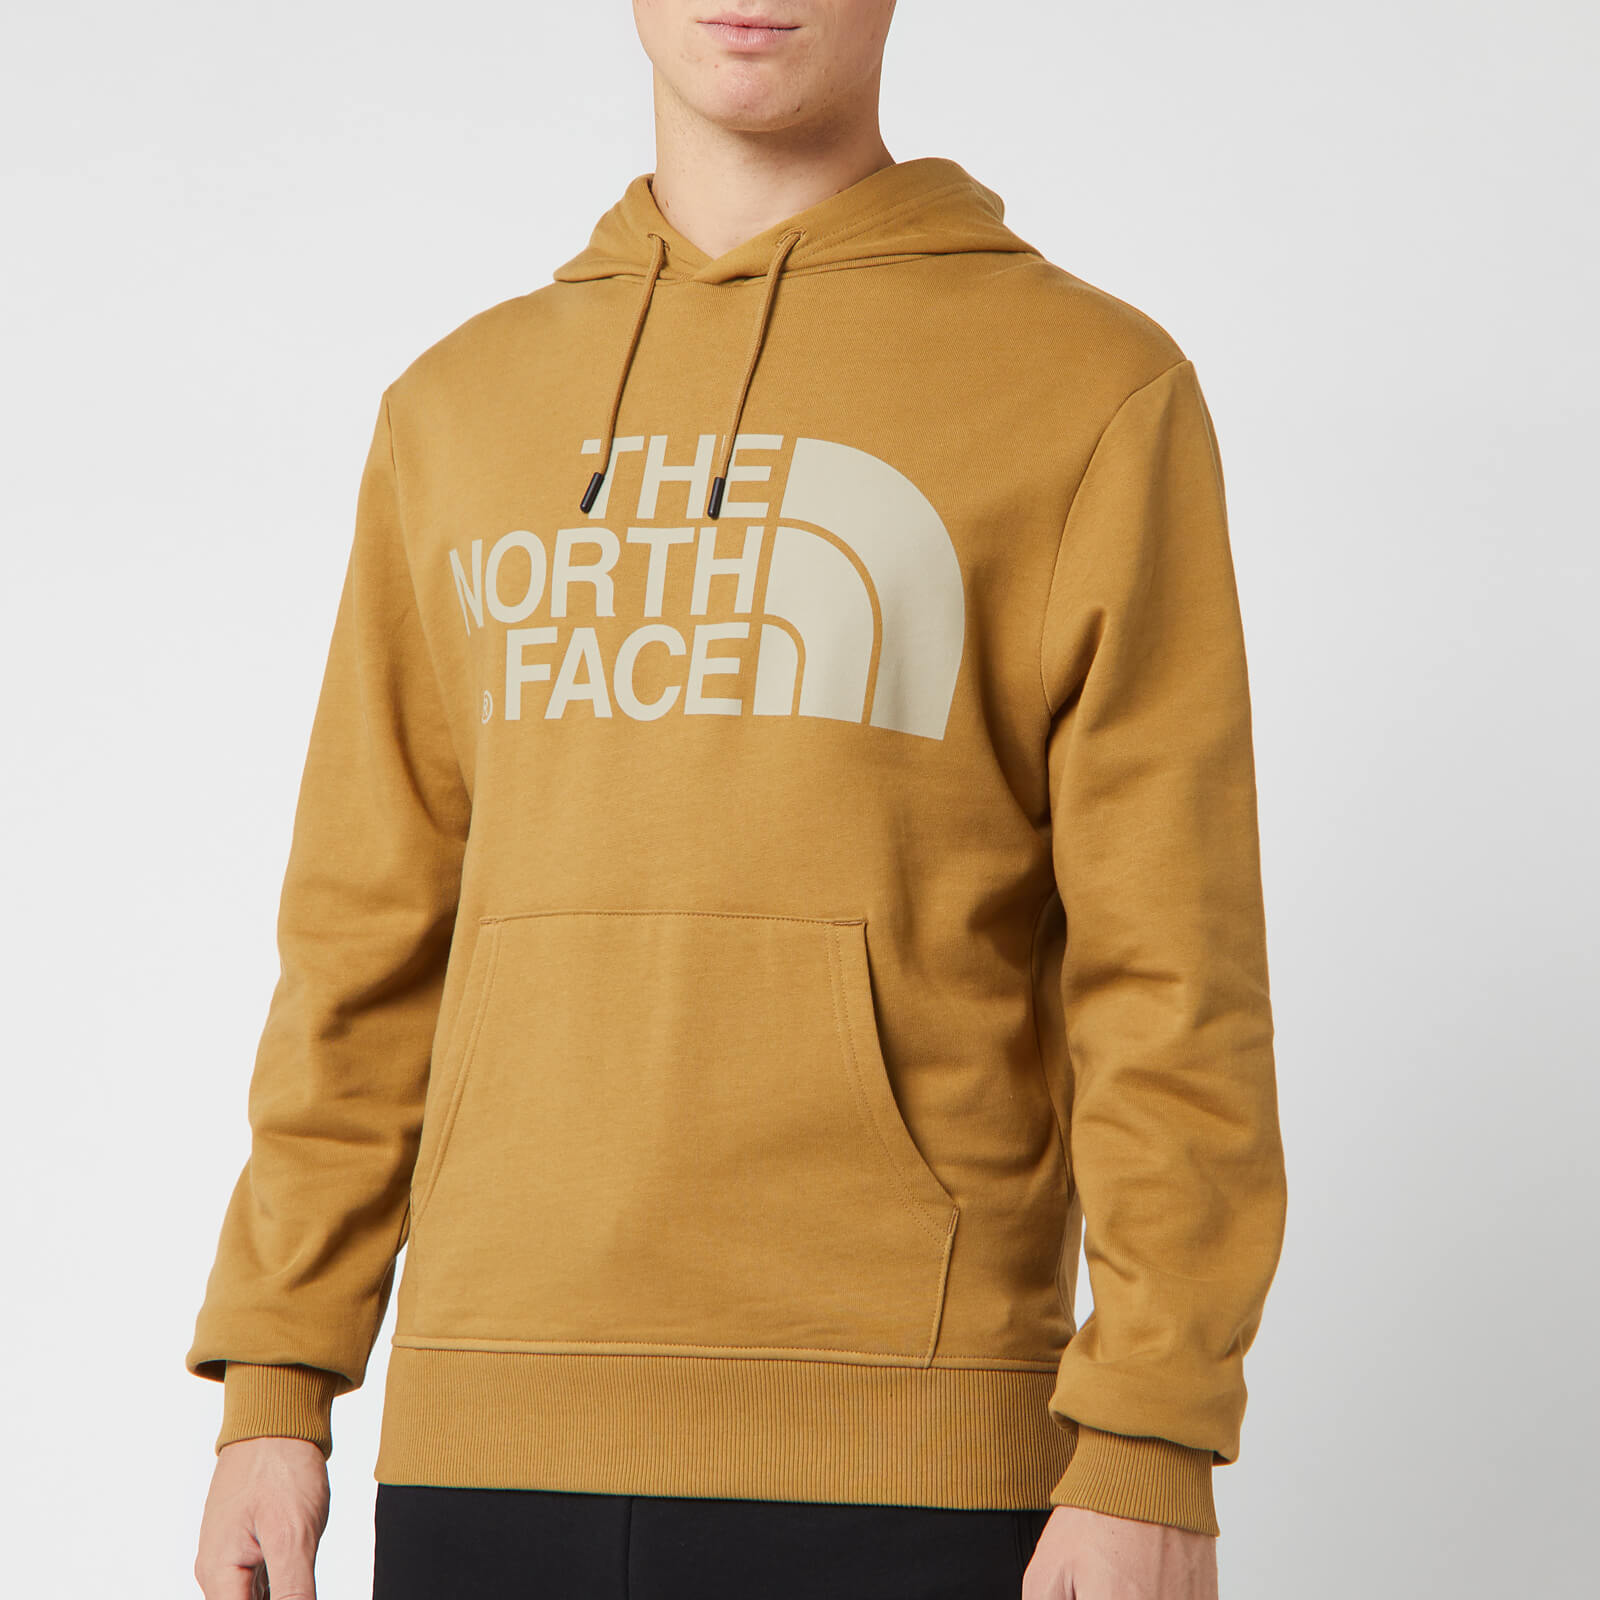 4951845f5 The North Face Men's Standard Hoody - British Khaki